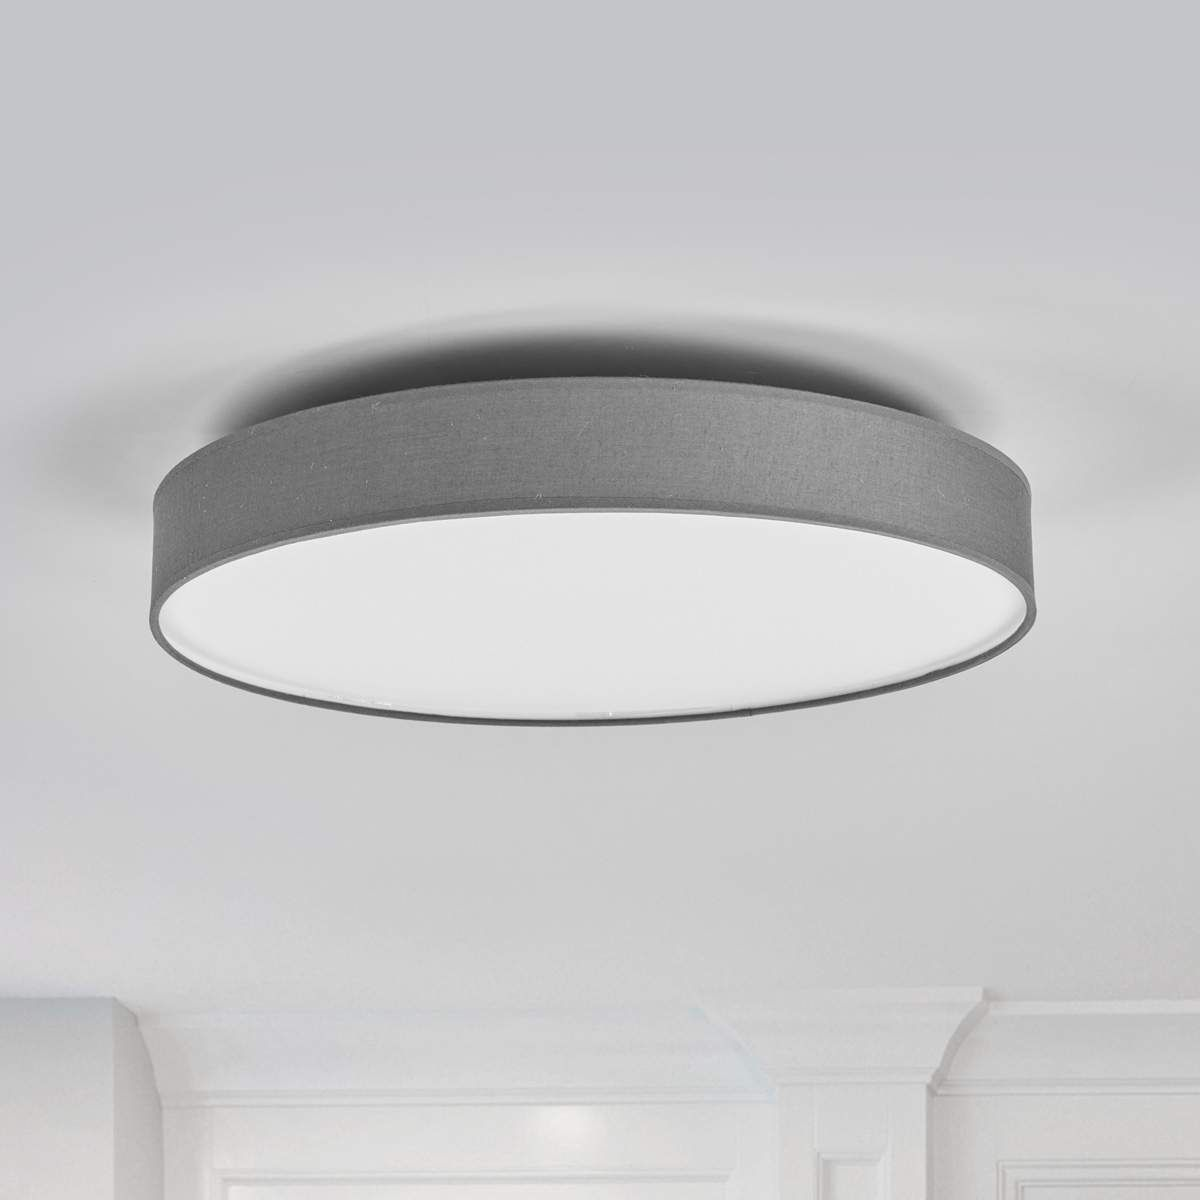 Led Stoffdeckenlampe Saira 50 Cm Grau Beleuchtung Decke Lampen Leuchtstoffrohre